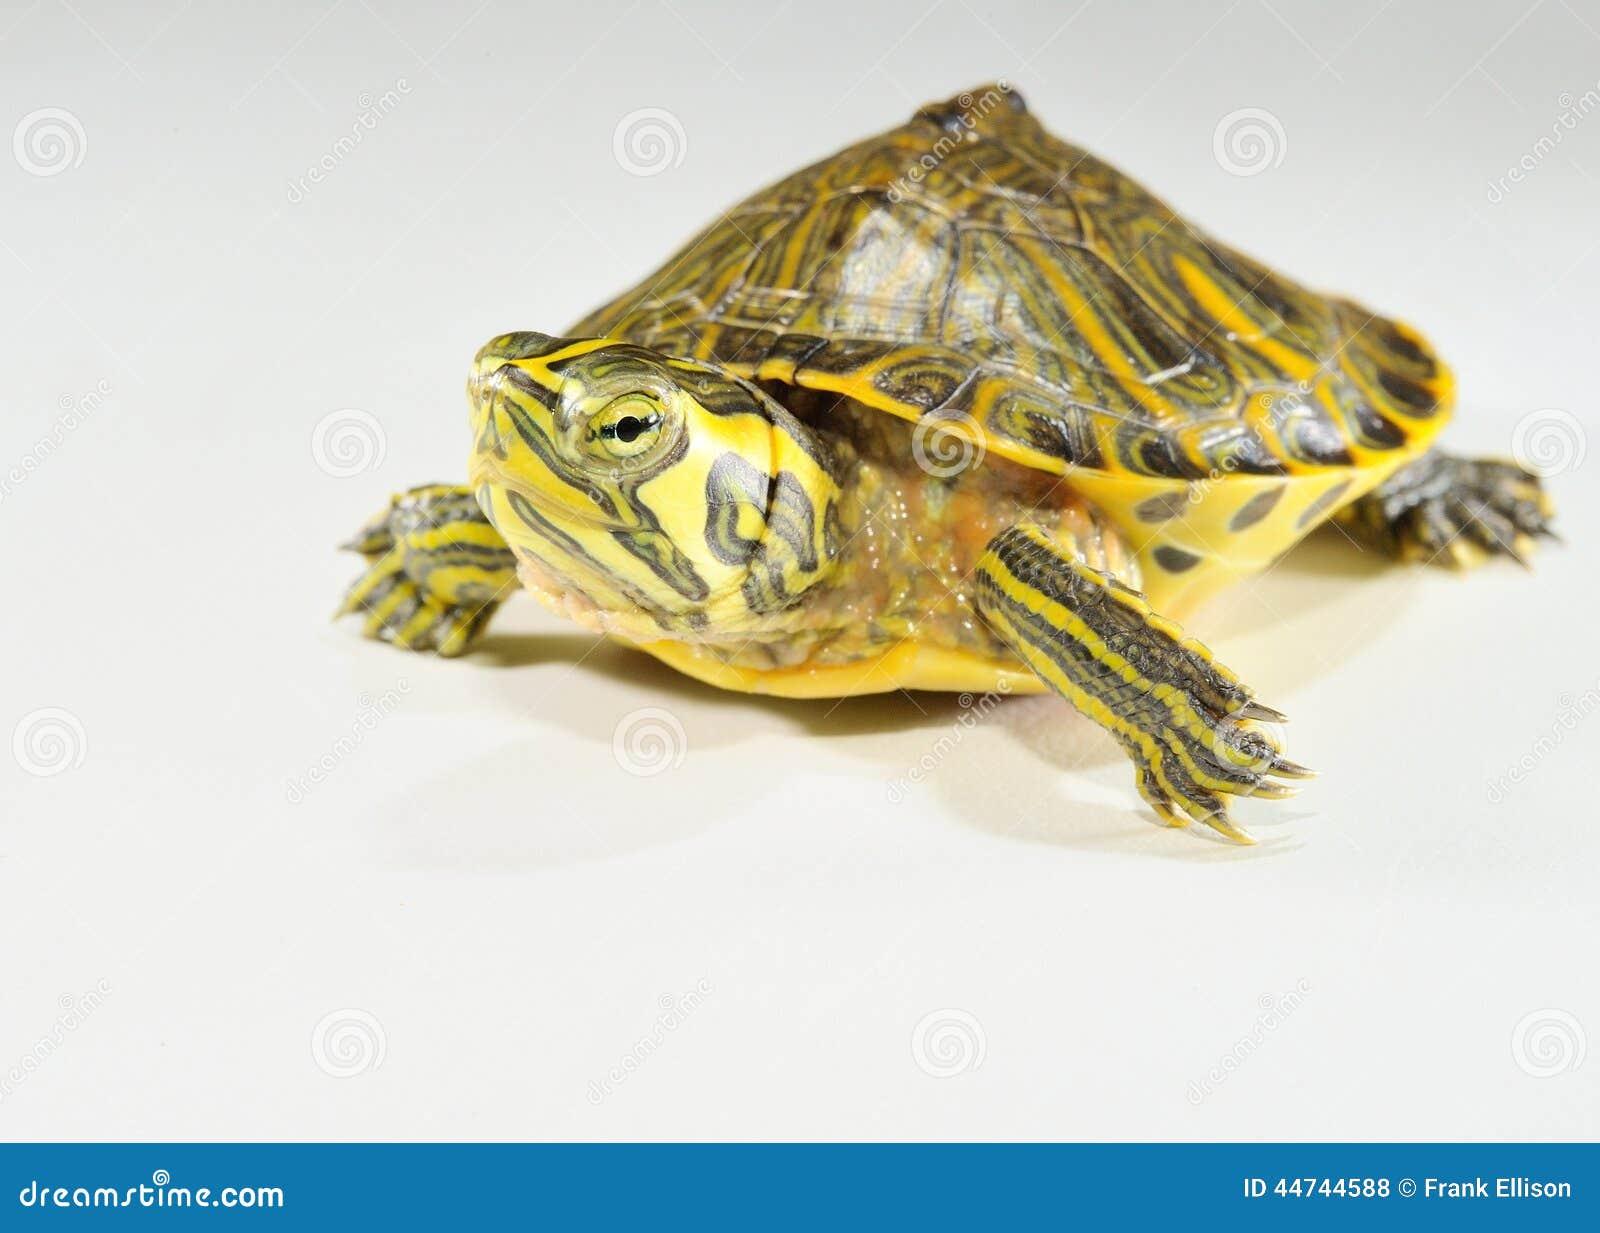 Baby Water Turtle Stock Photo - Image: 44744588